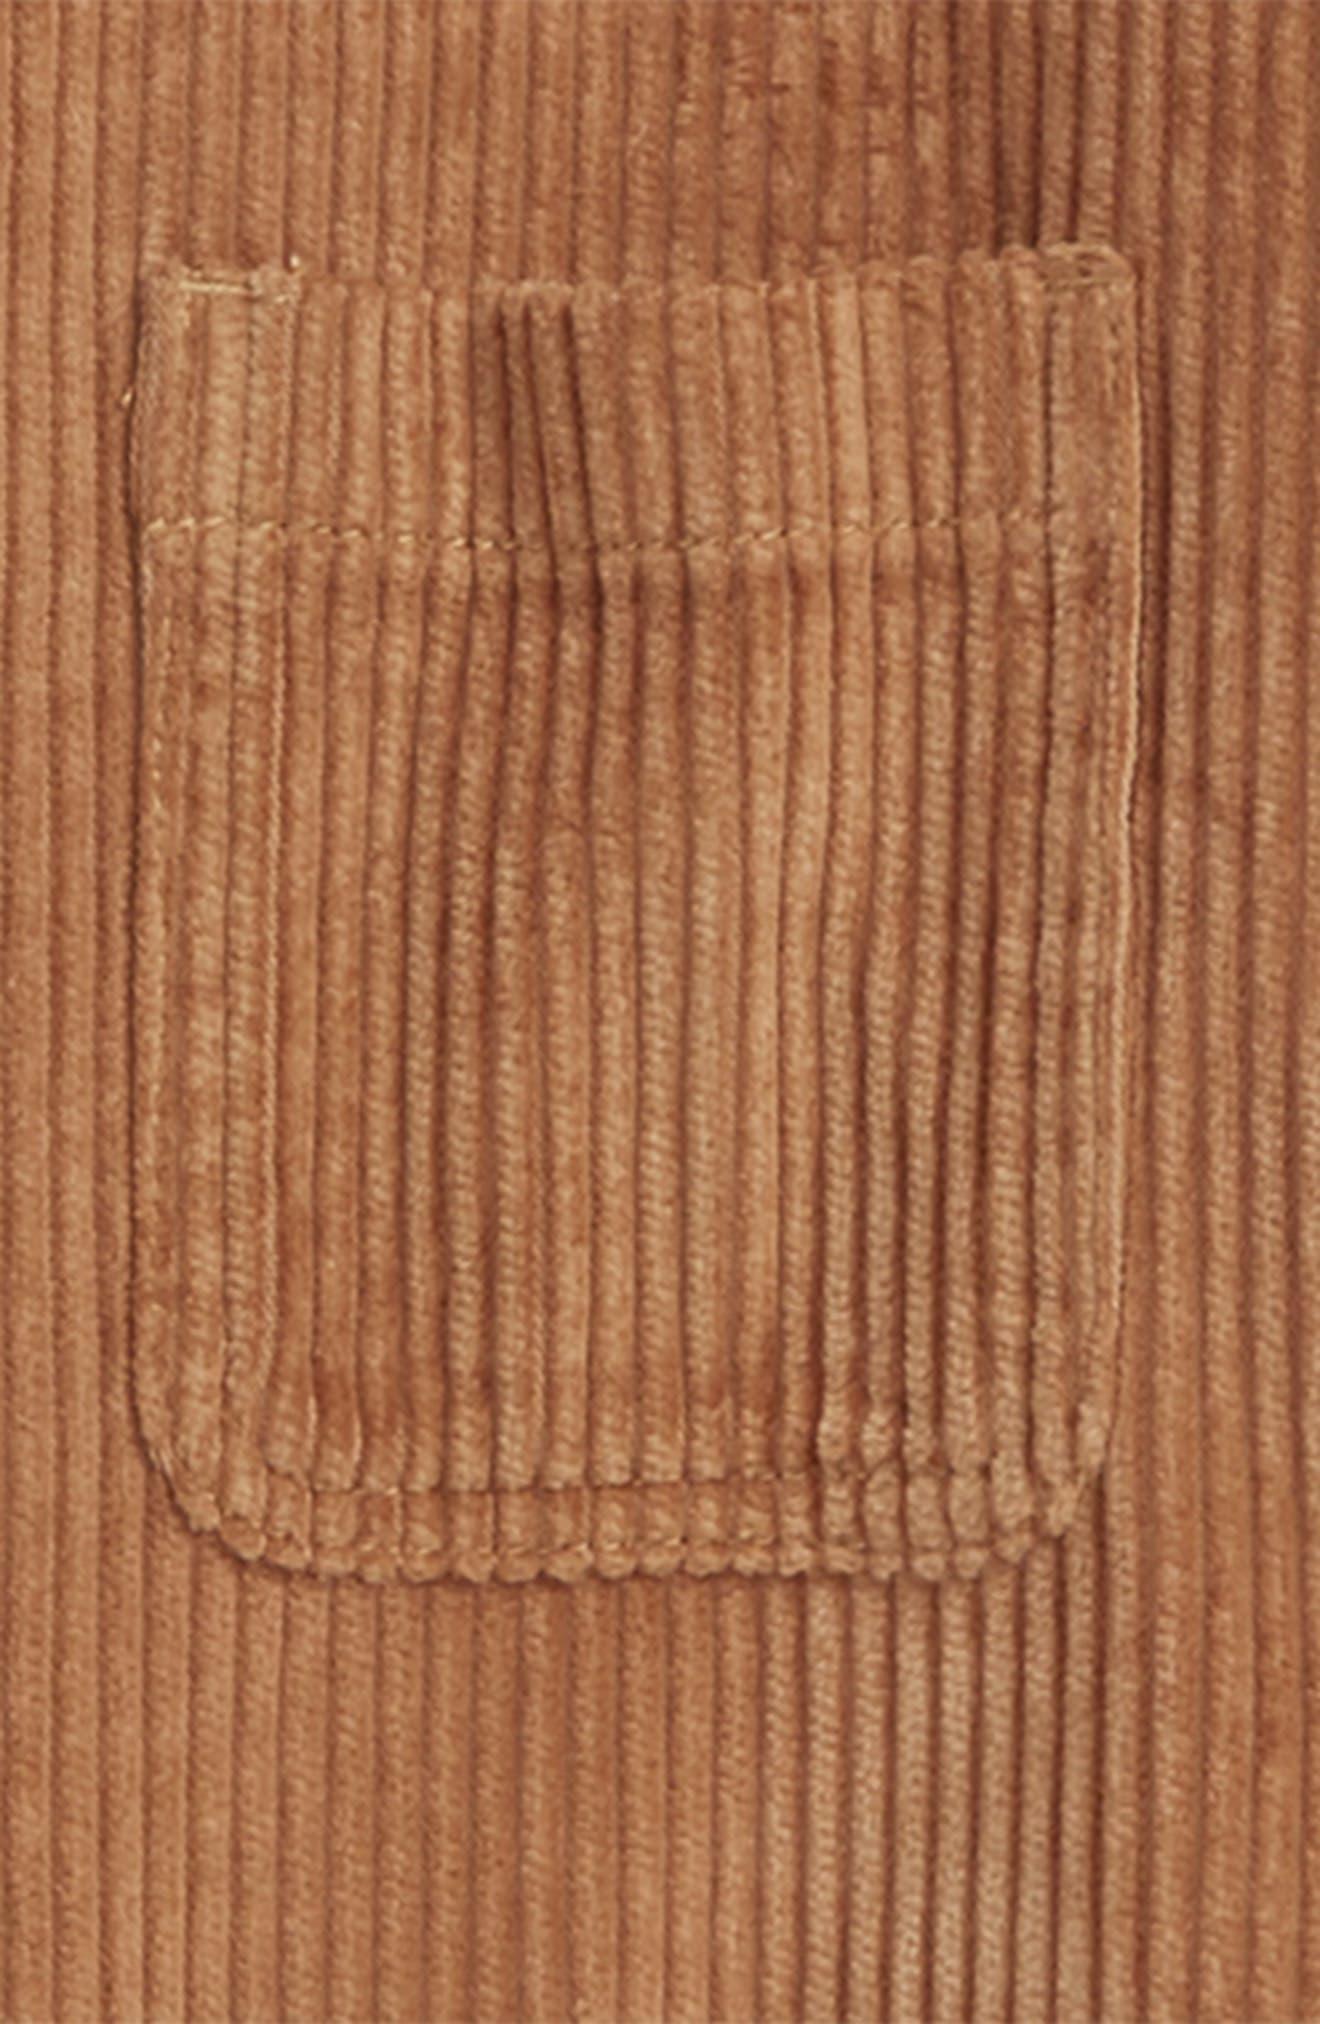 Tresaure & Bond Corduroy Button Front Hoodie,                             Alternate thumbnail 2, color,                             BROWN DIJON